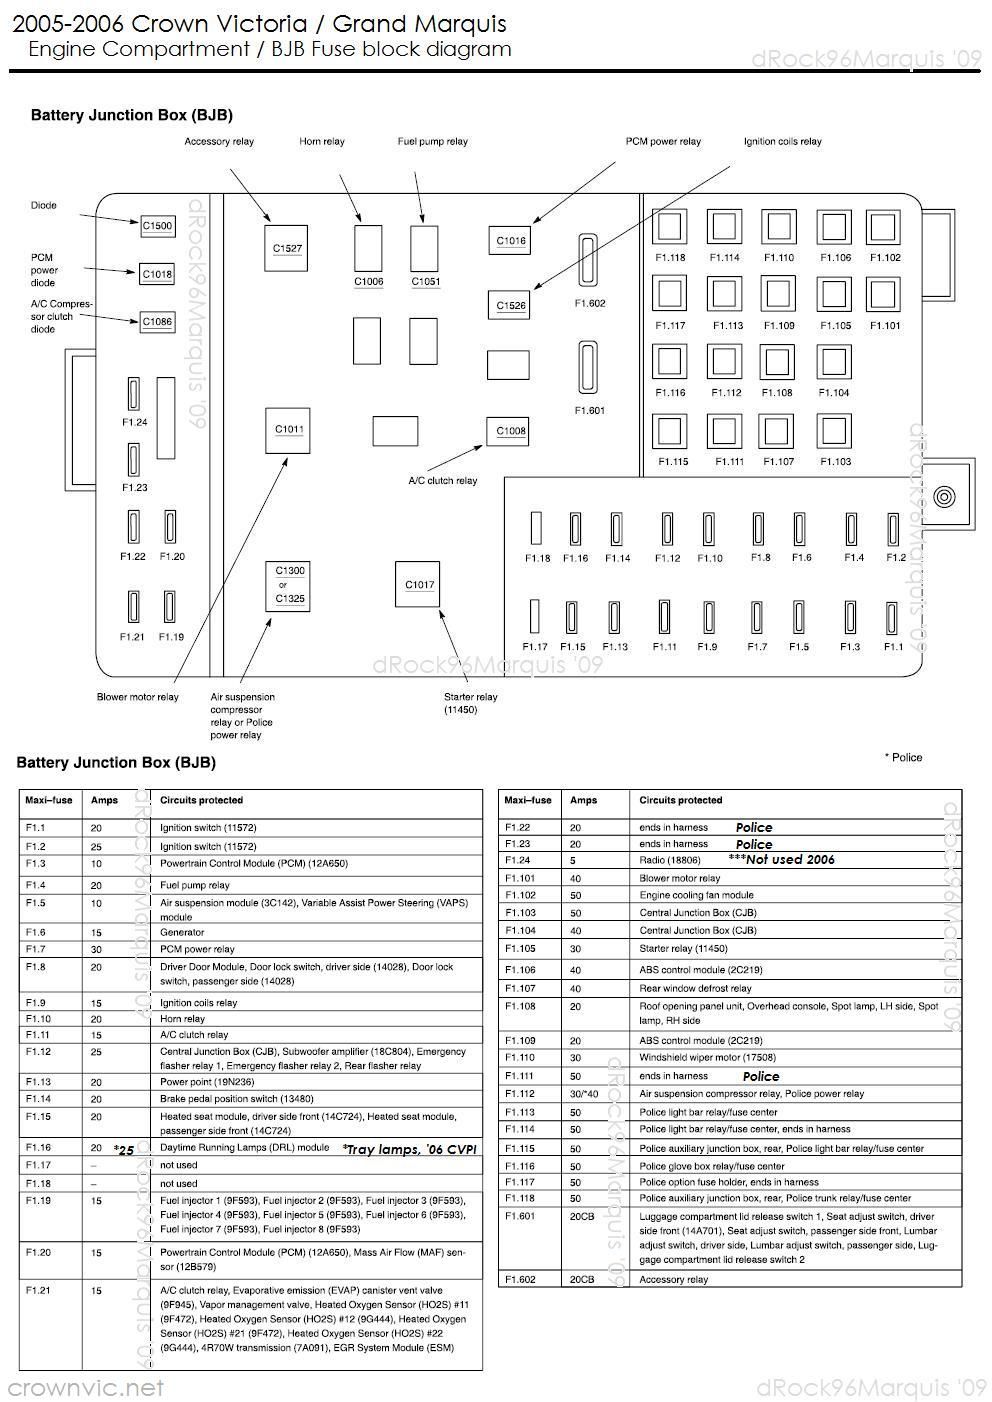 bb_2178] 2005 ford crown victoria fuse panel diagram download diagram  abole ation usly osuri cana sand ynthe sapre vesi para numap mohammedshrine  librar wiring 101